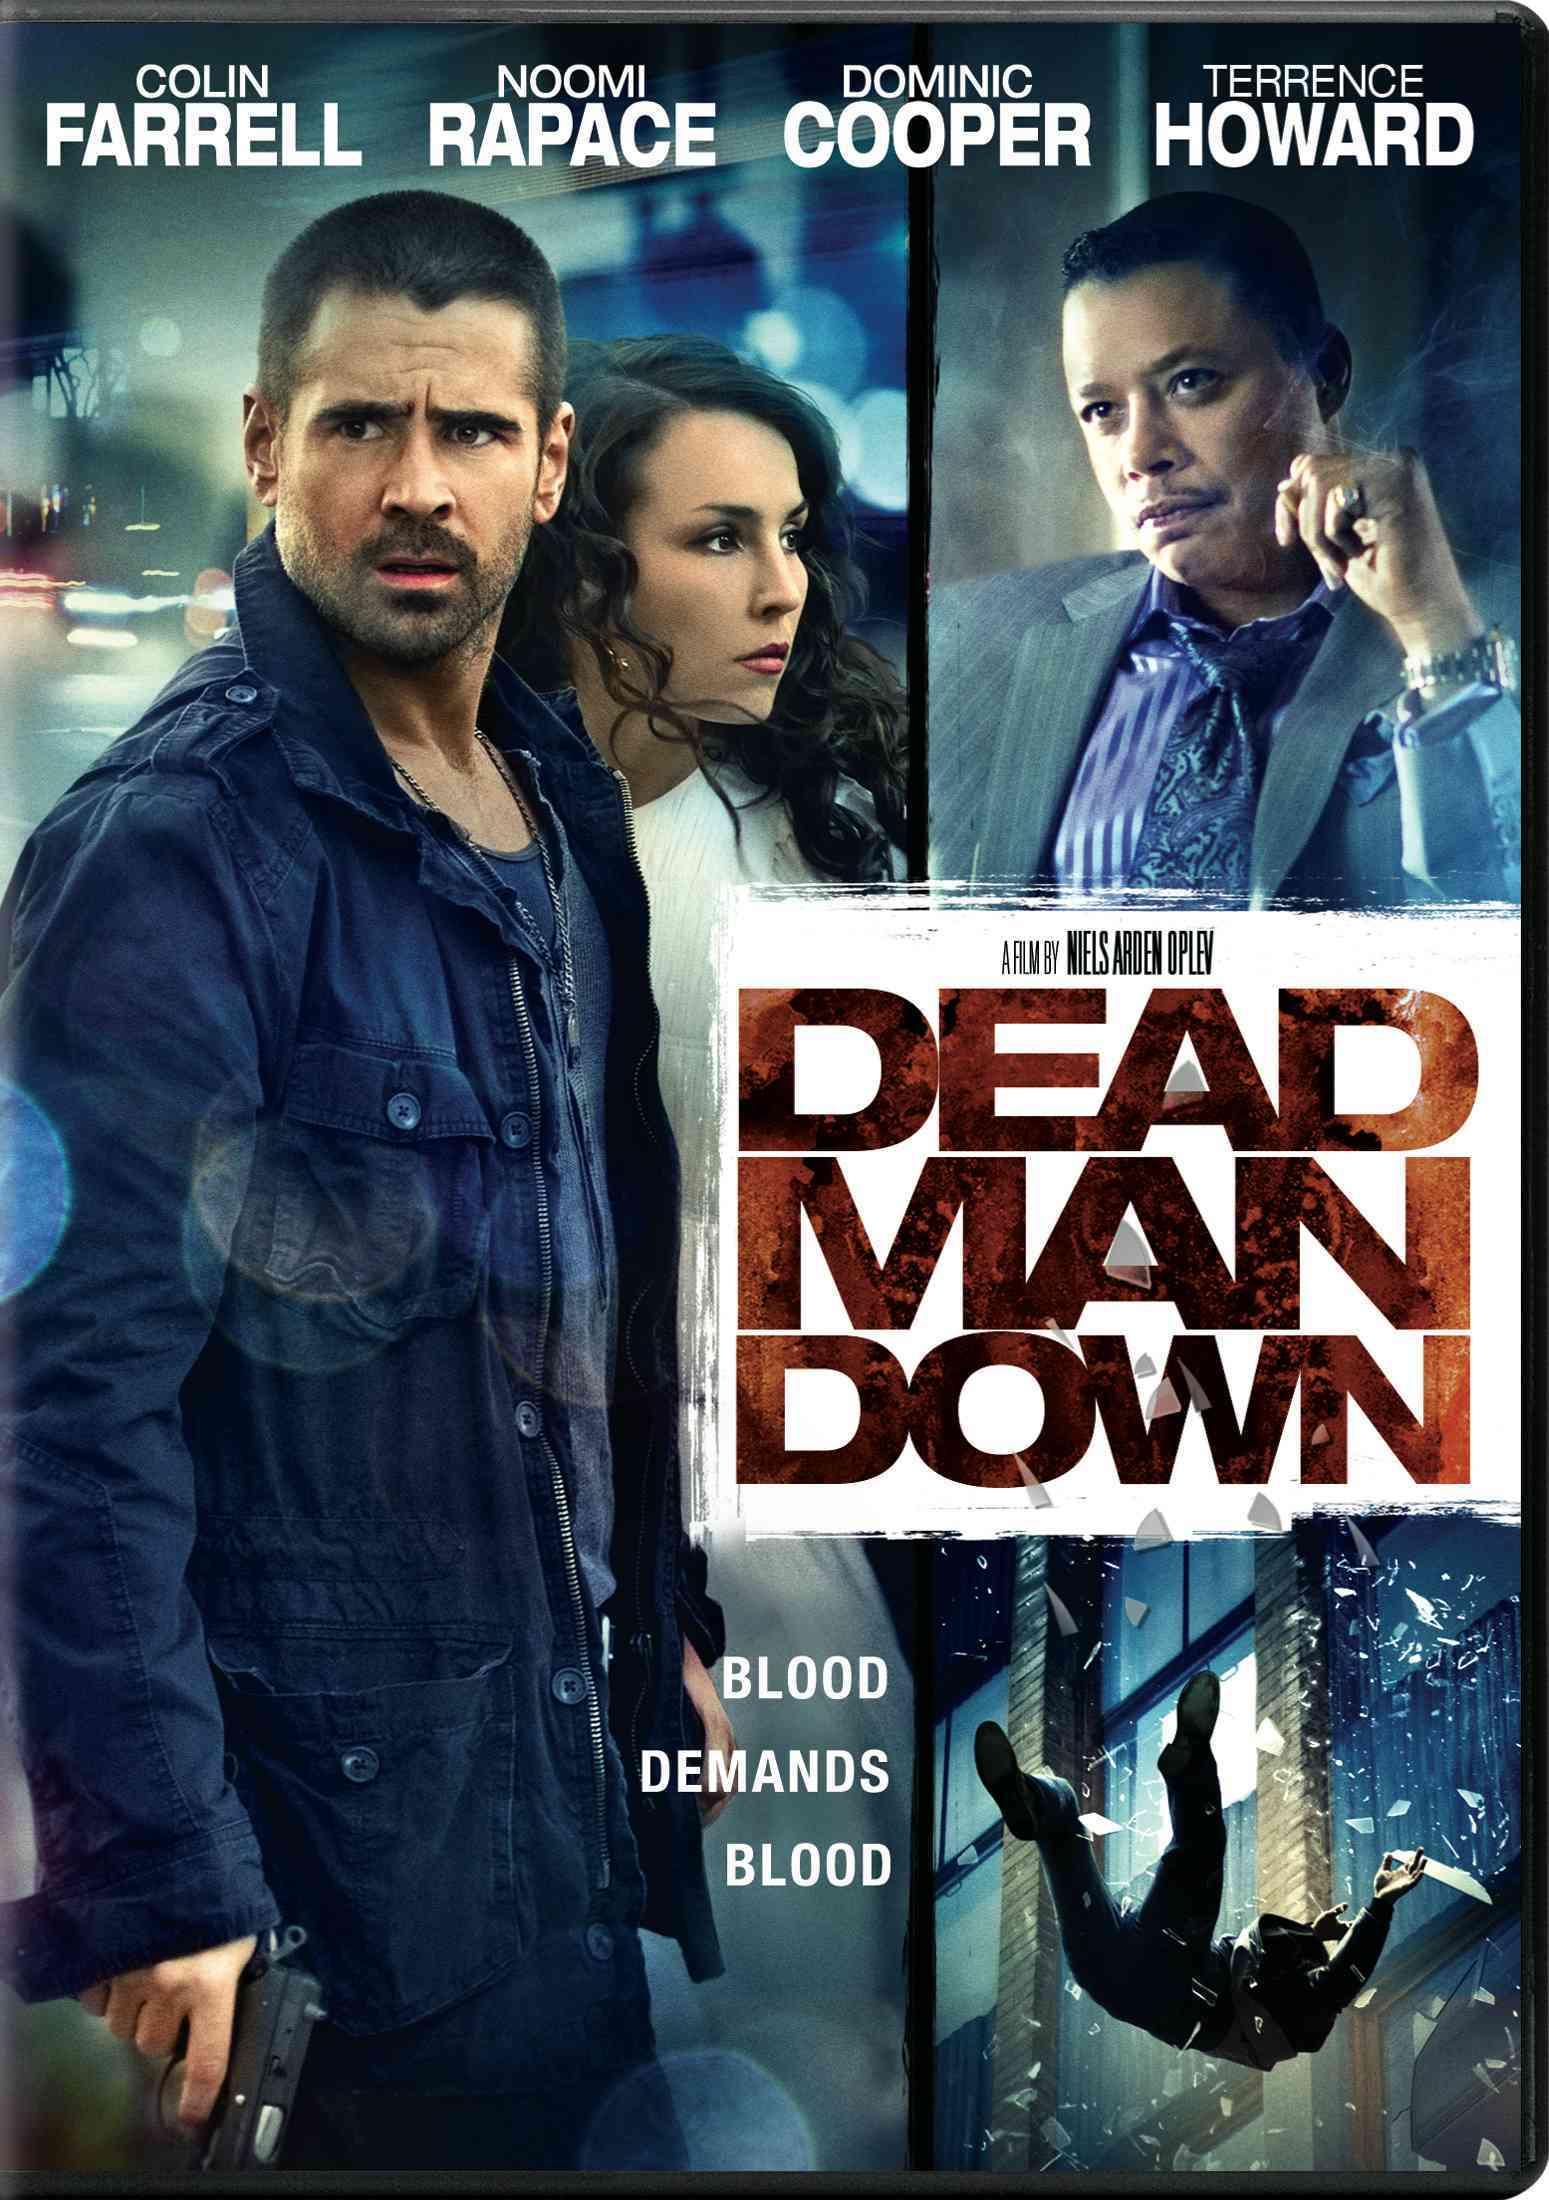 DEAD MAN DOWN BY FARRELL,COLIN (DVD)